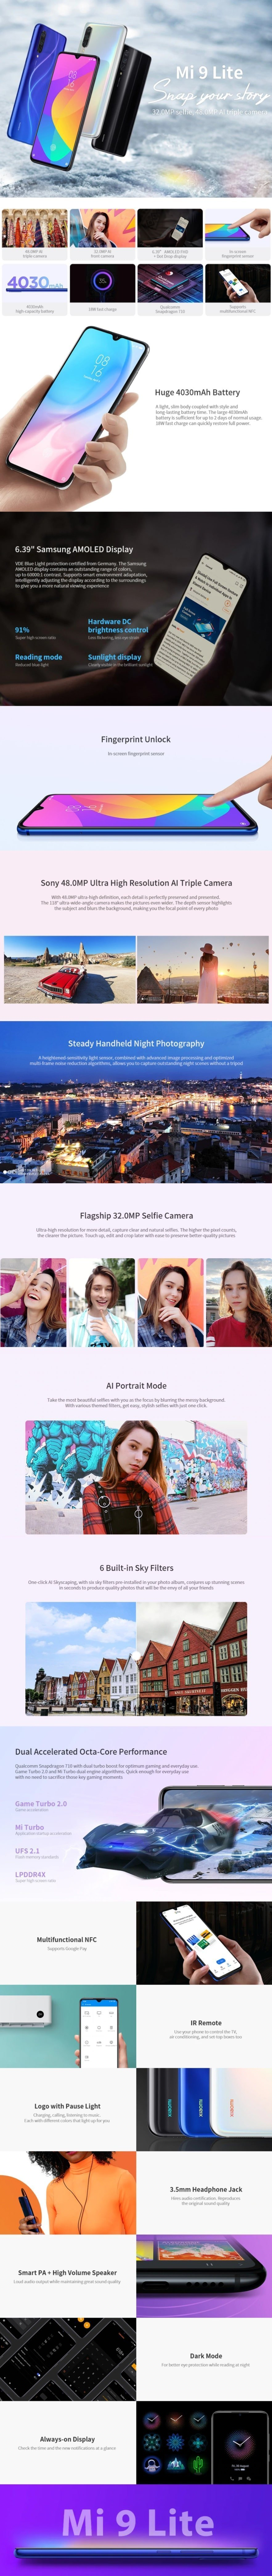 Black Friday Sale Xiaomi Mi 9 Lite